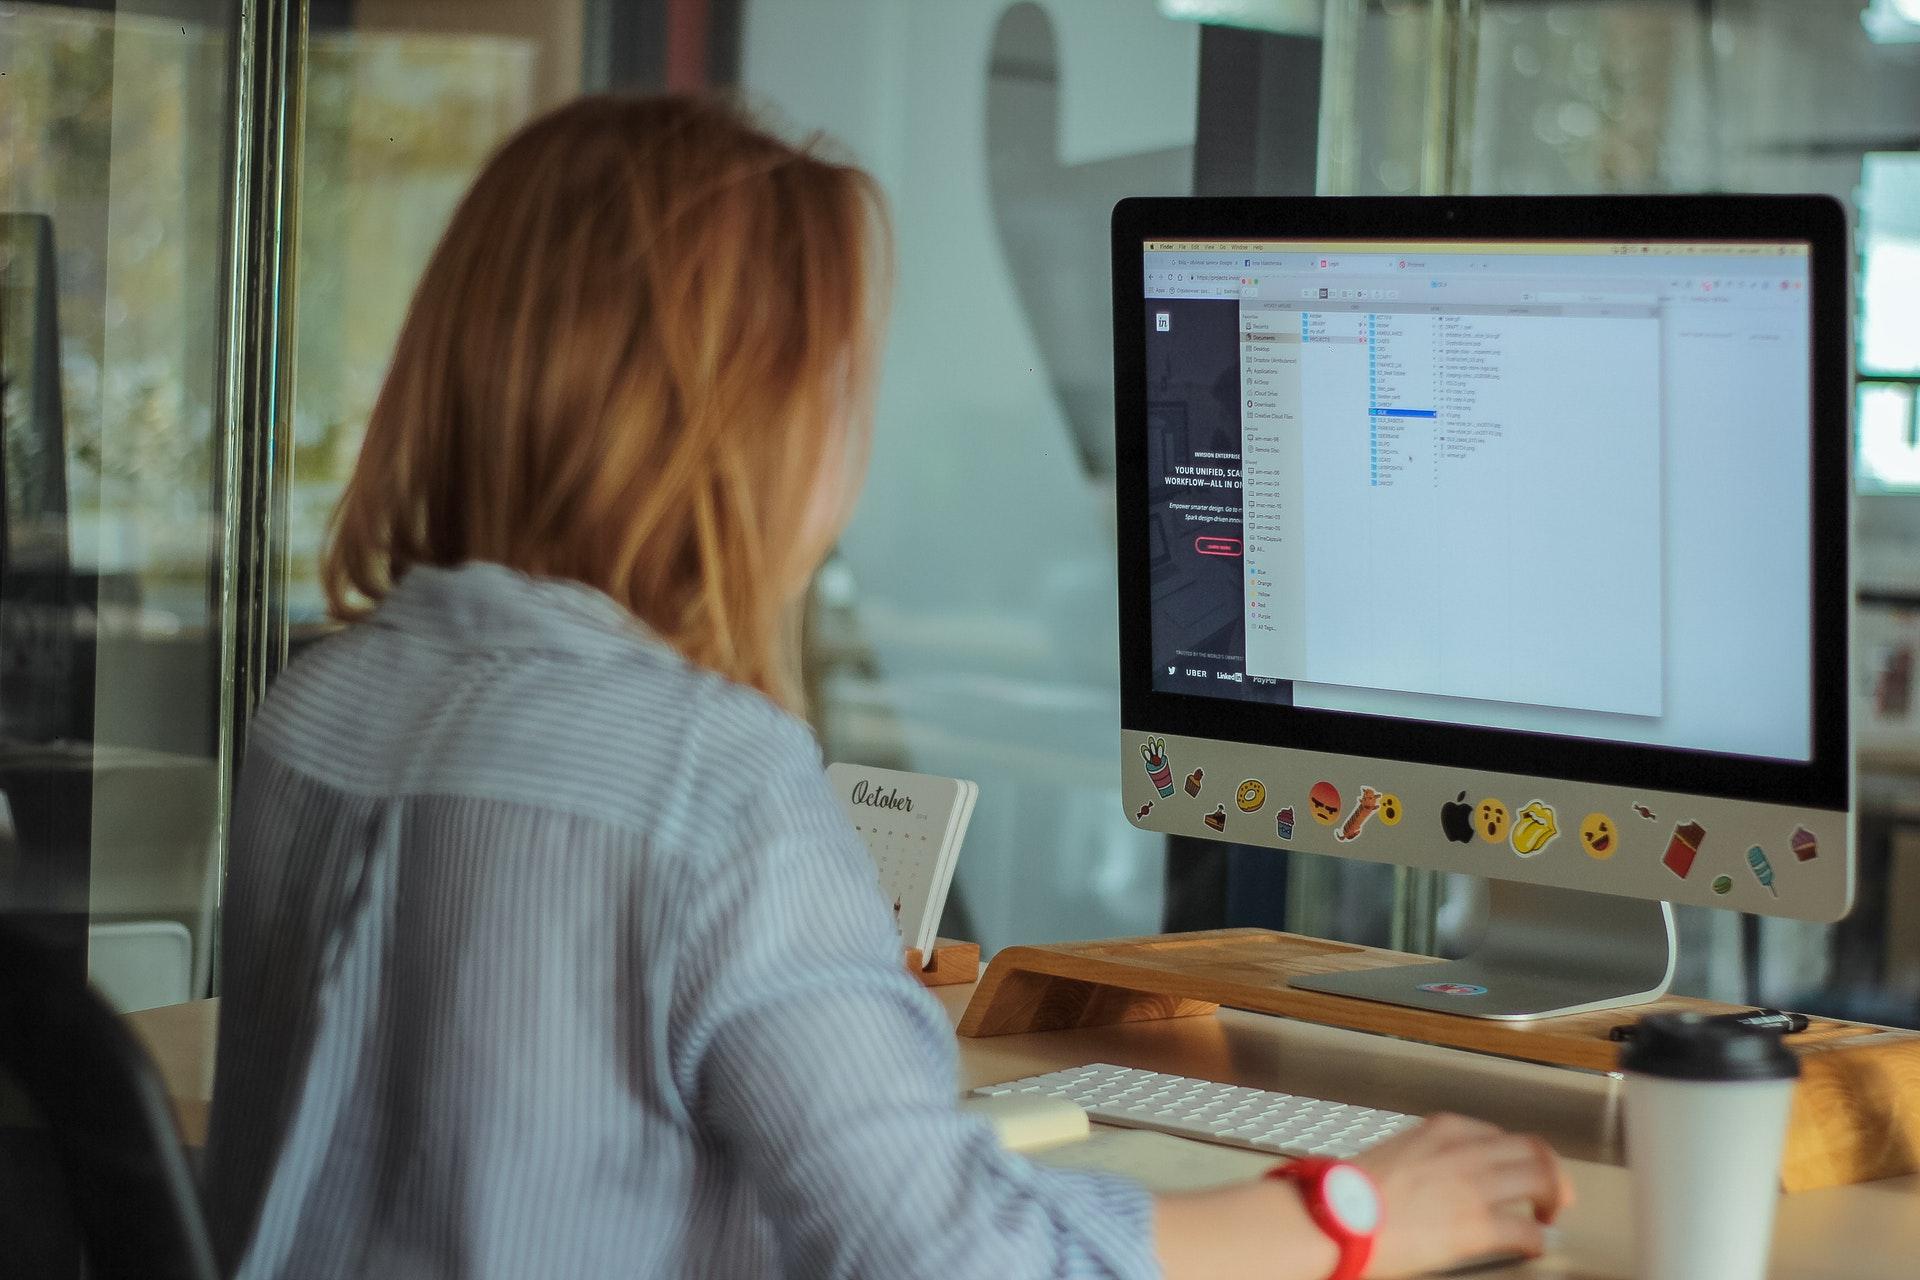 brunette-computer-computer-keyboard-2084974 (1).jpg